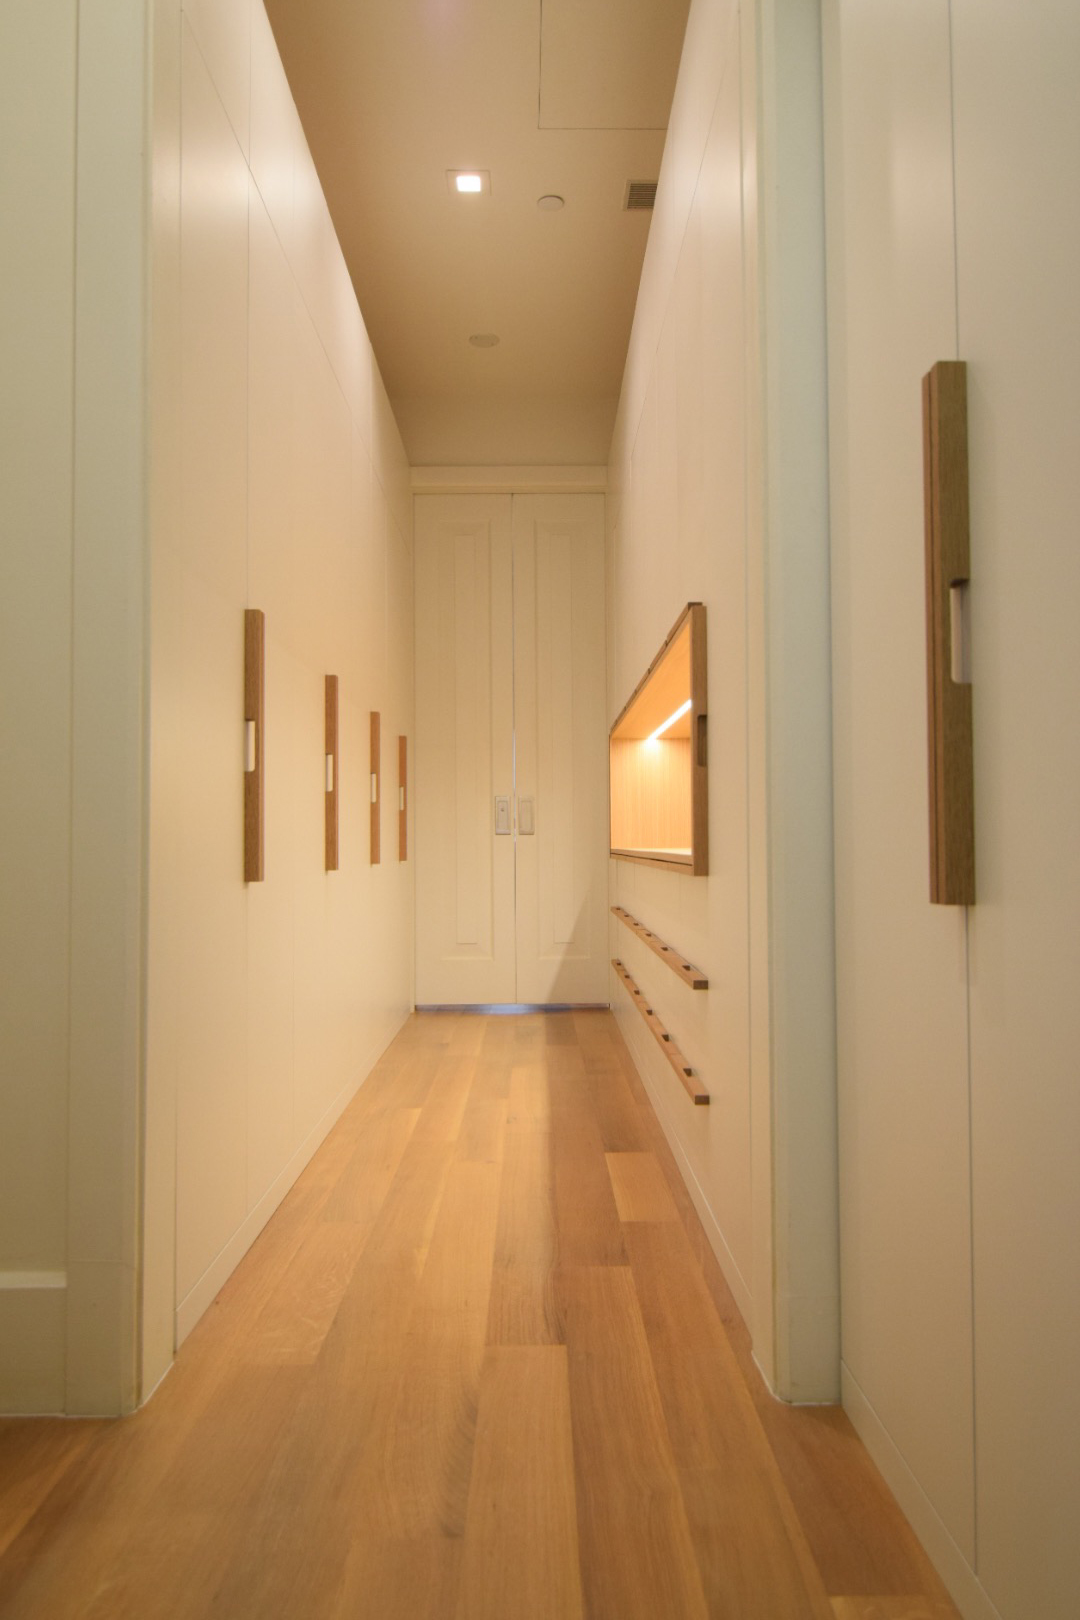 custom-walk-in-closet-white-lacquer-finish-maple-interior-white-oak-handles-white-oak-accent-open-display-cabinet-portrait-view.jpg